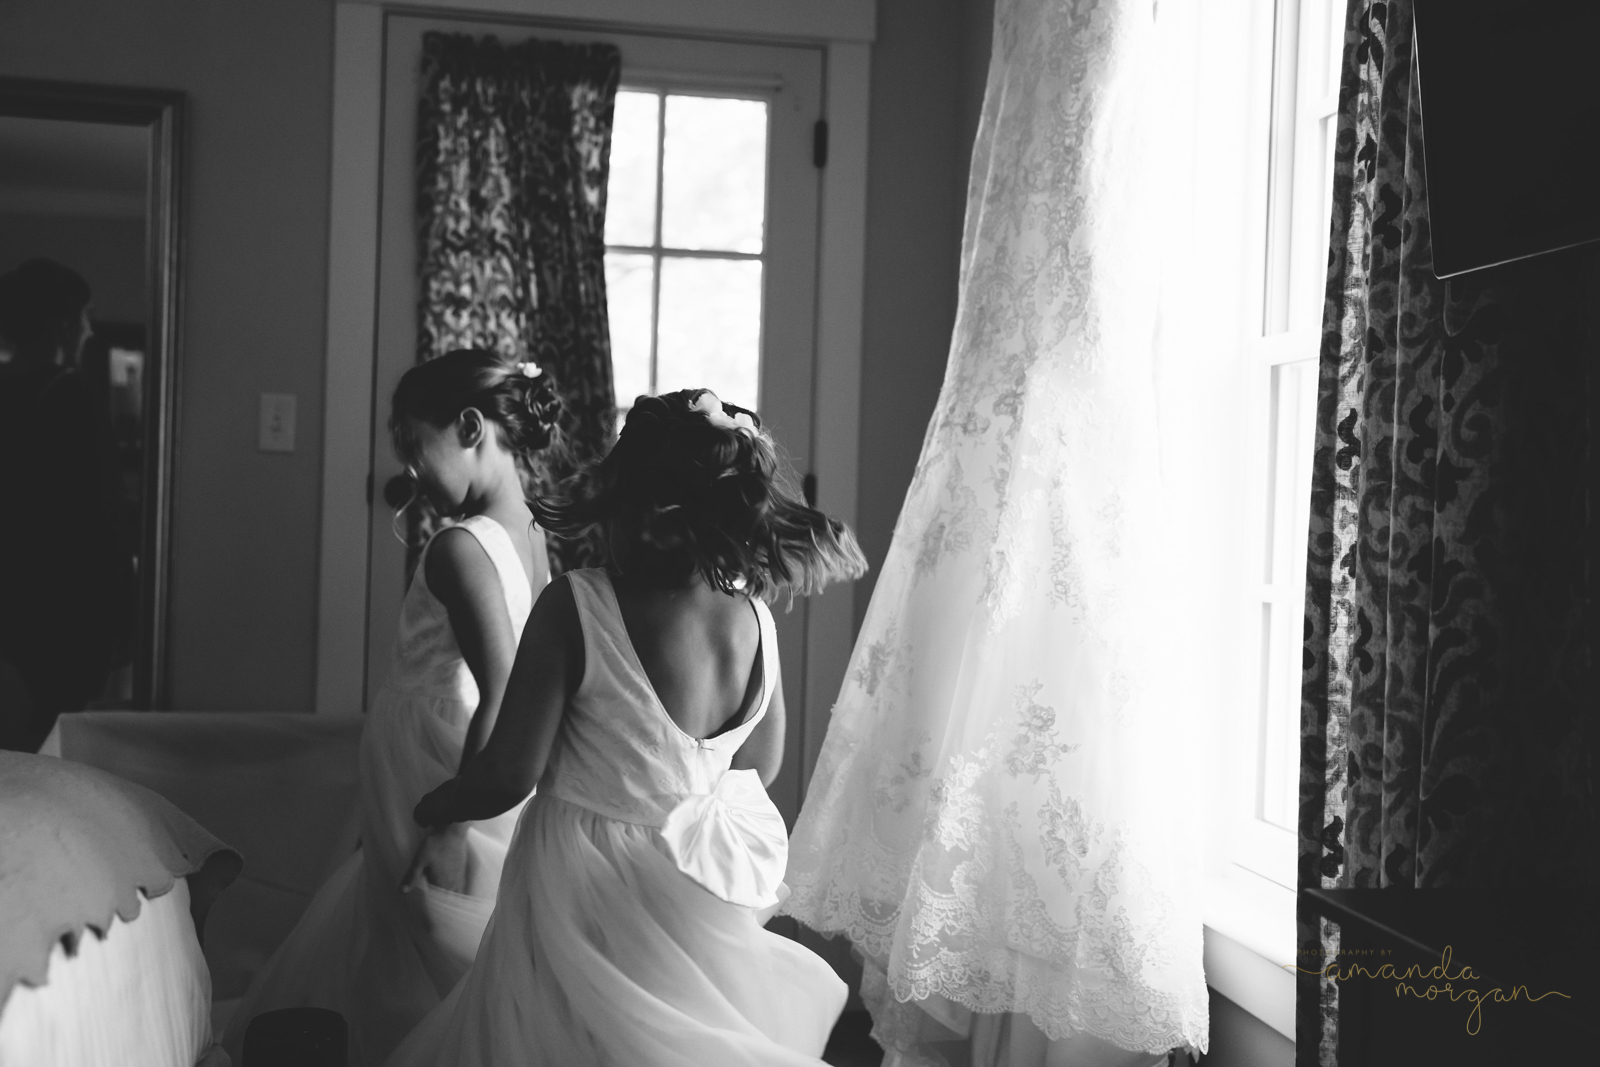 Publick-House-Wedding-Amanda-Morgan-6.jpg